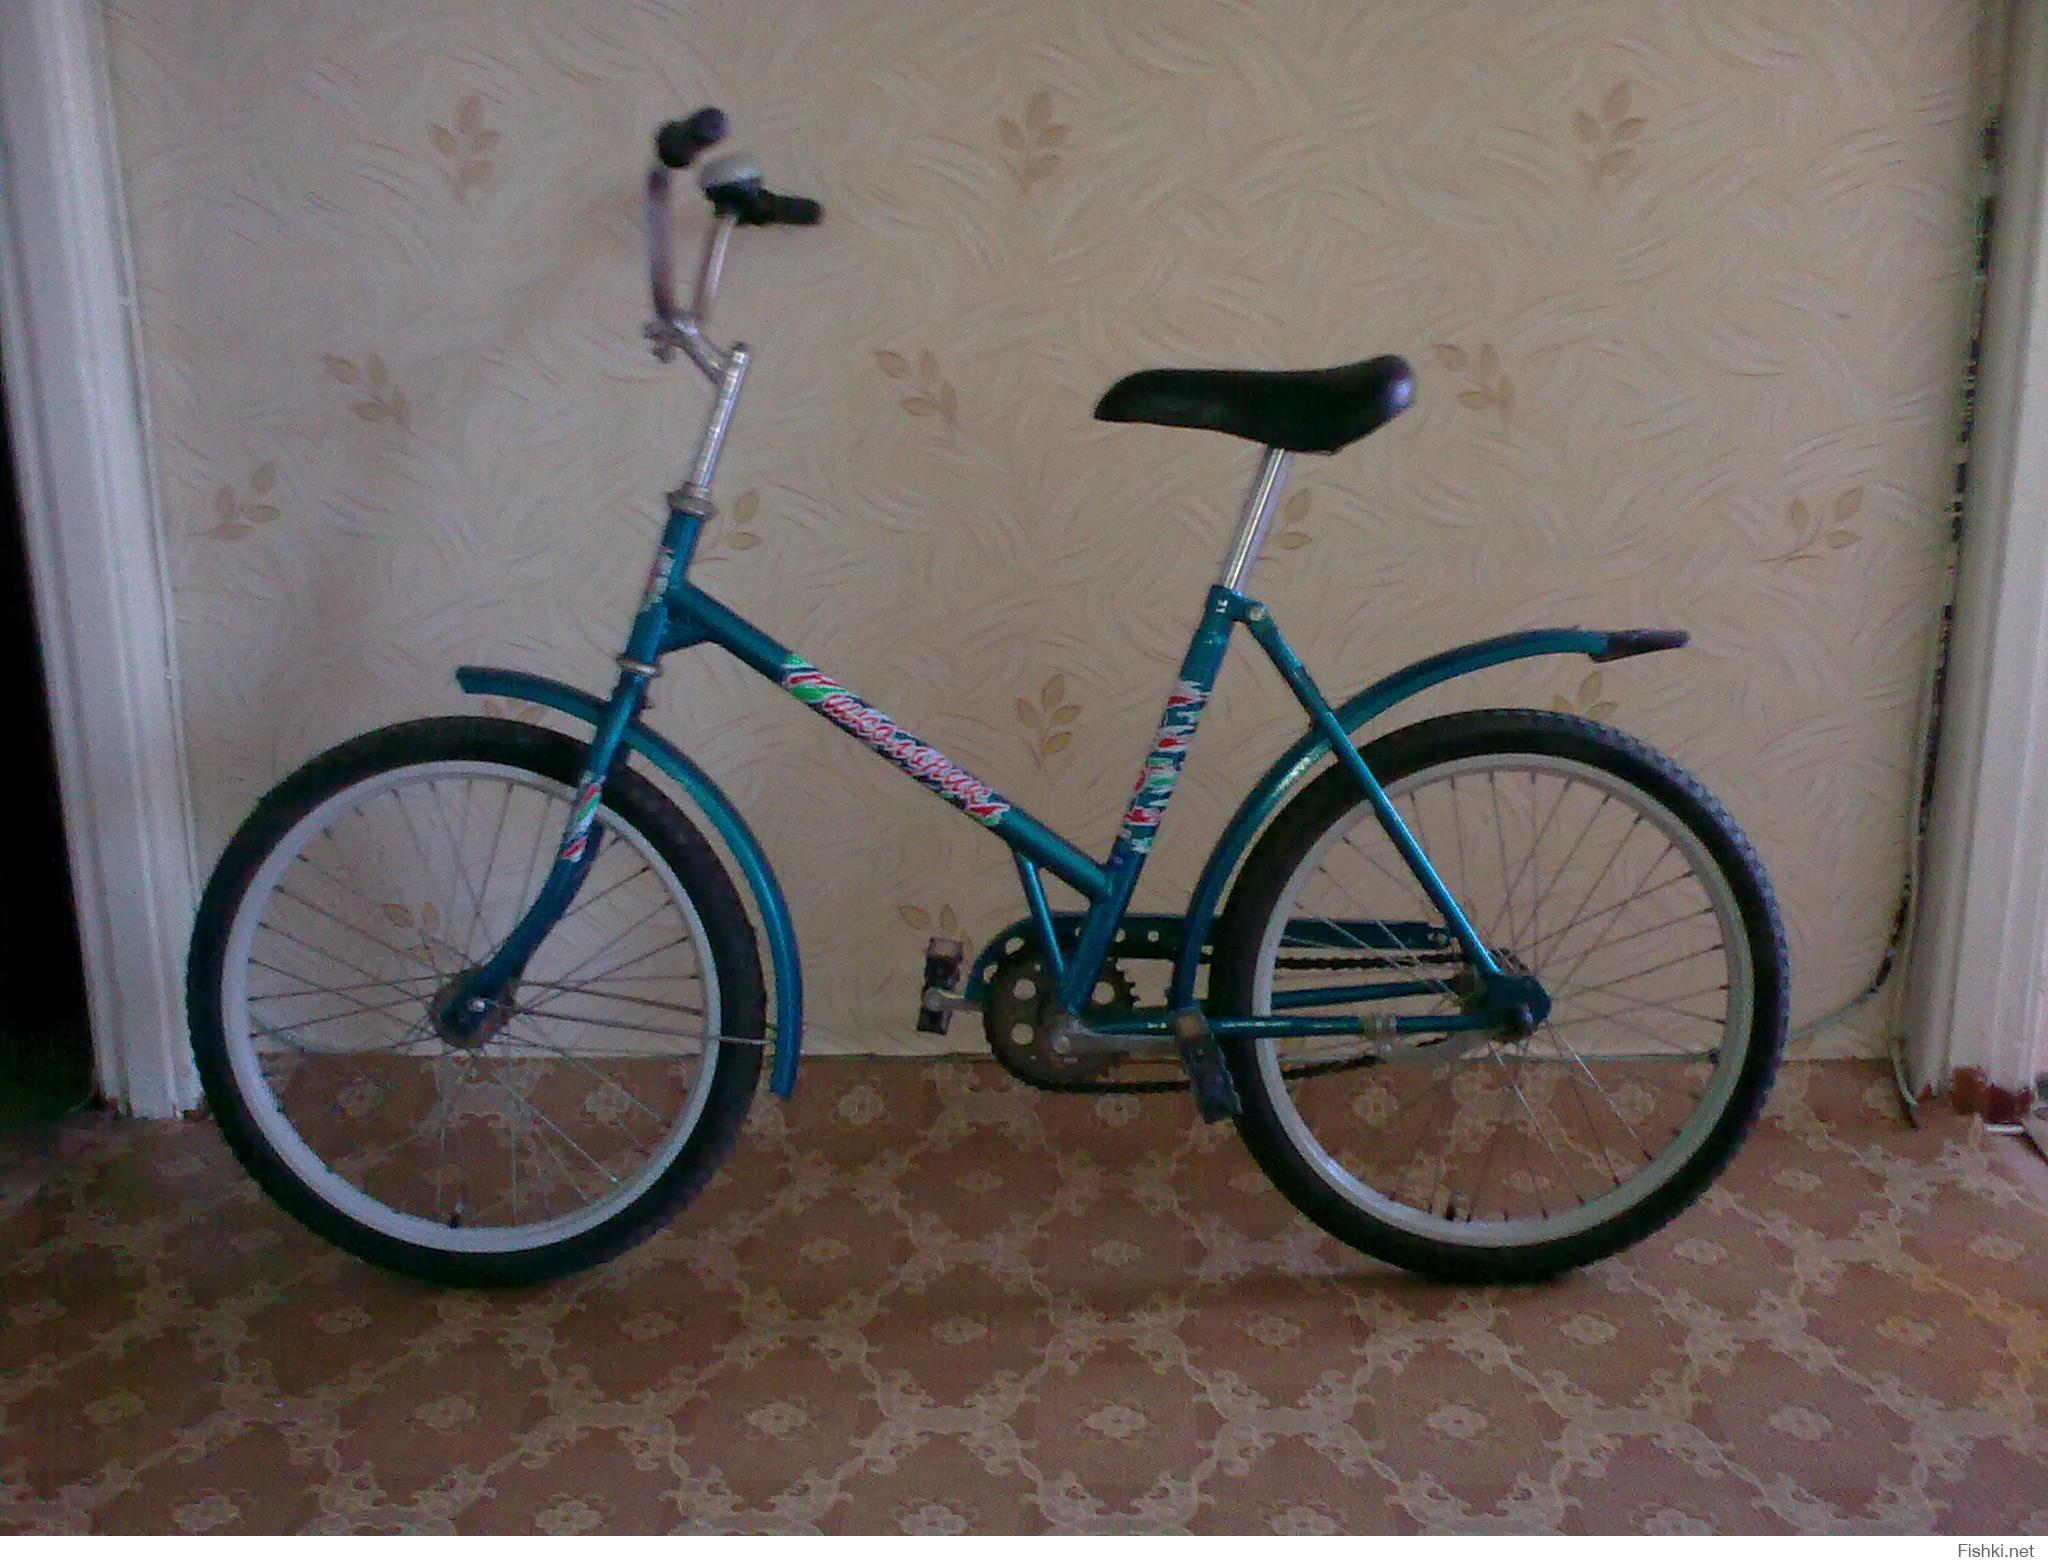 Картинка велосипед школьник